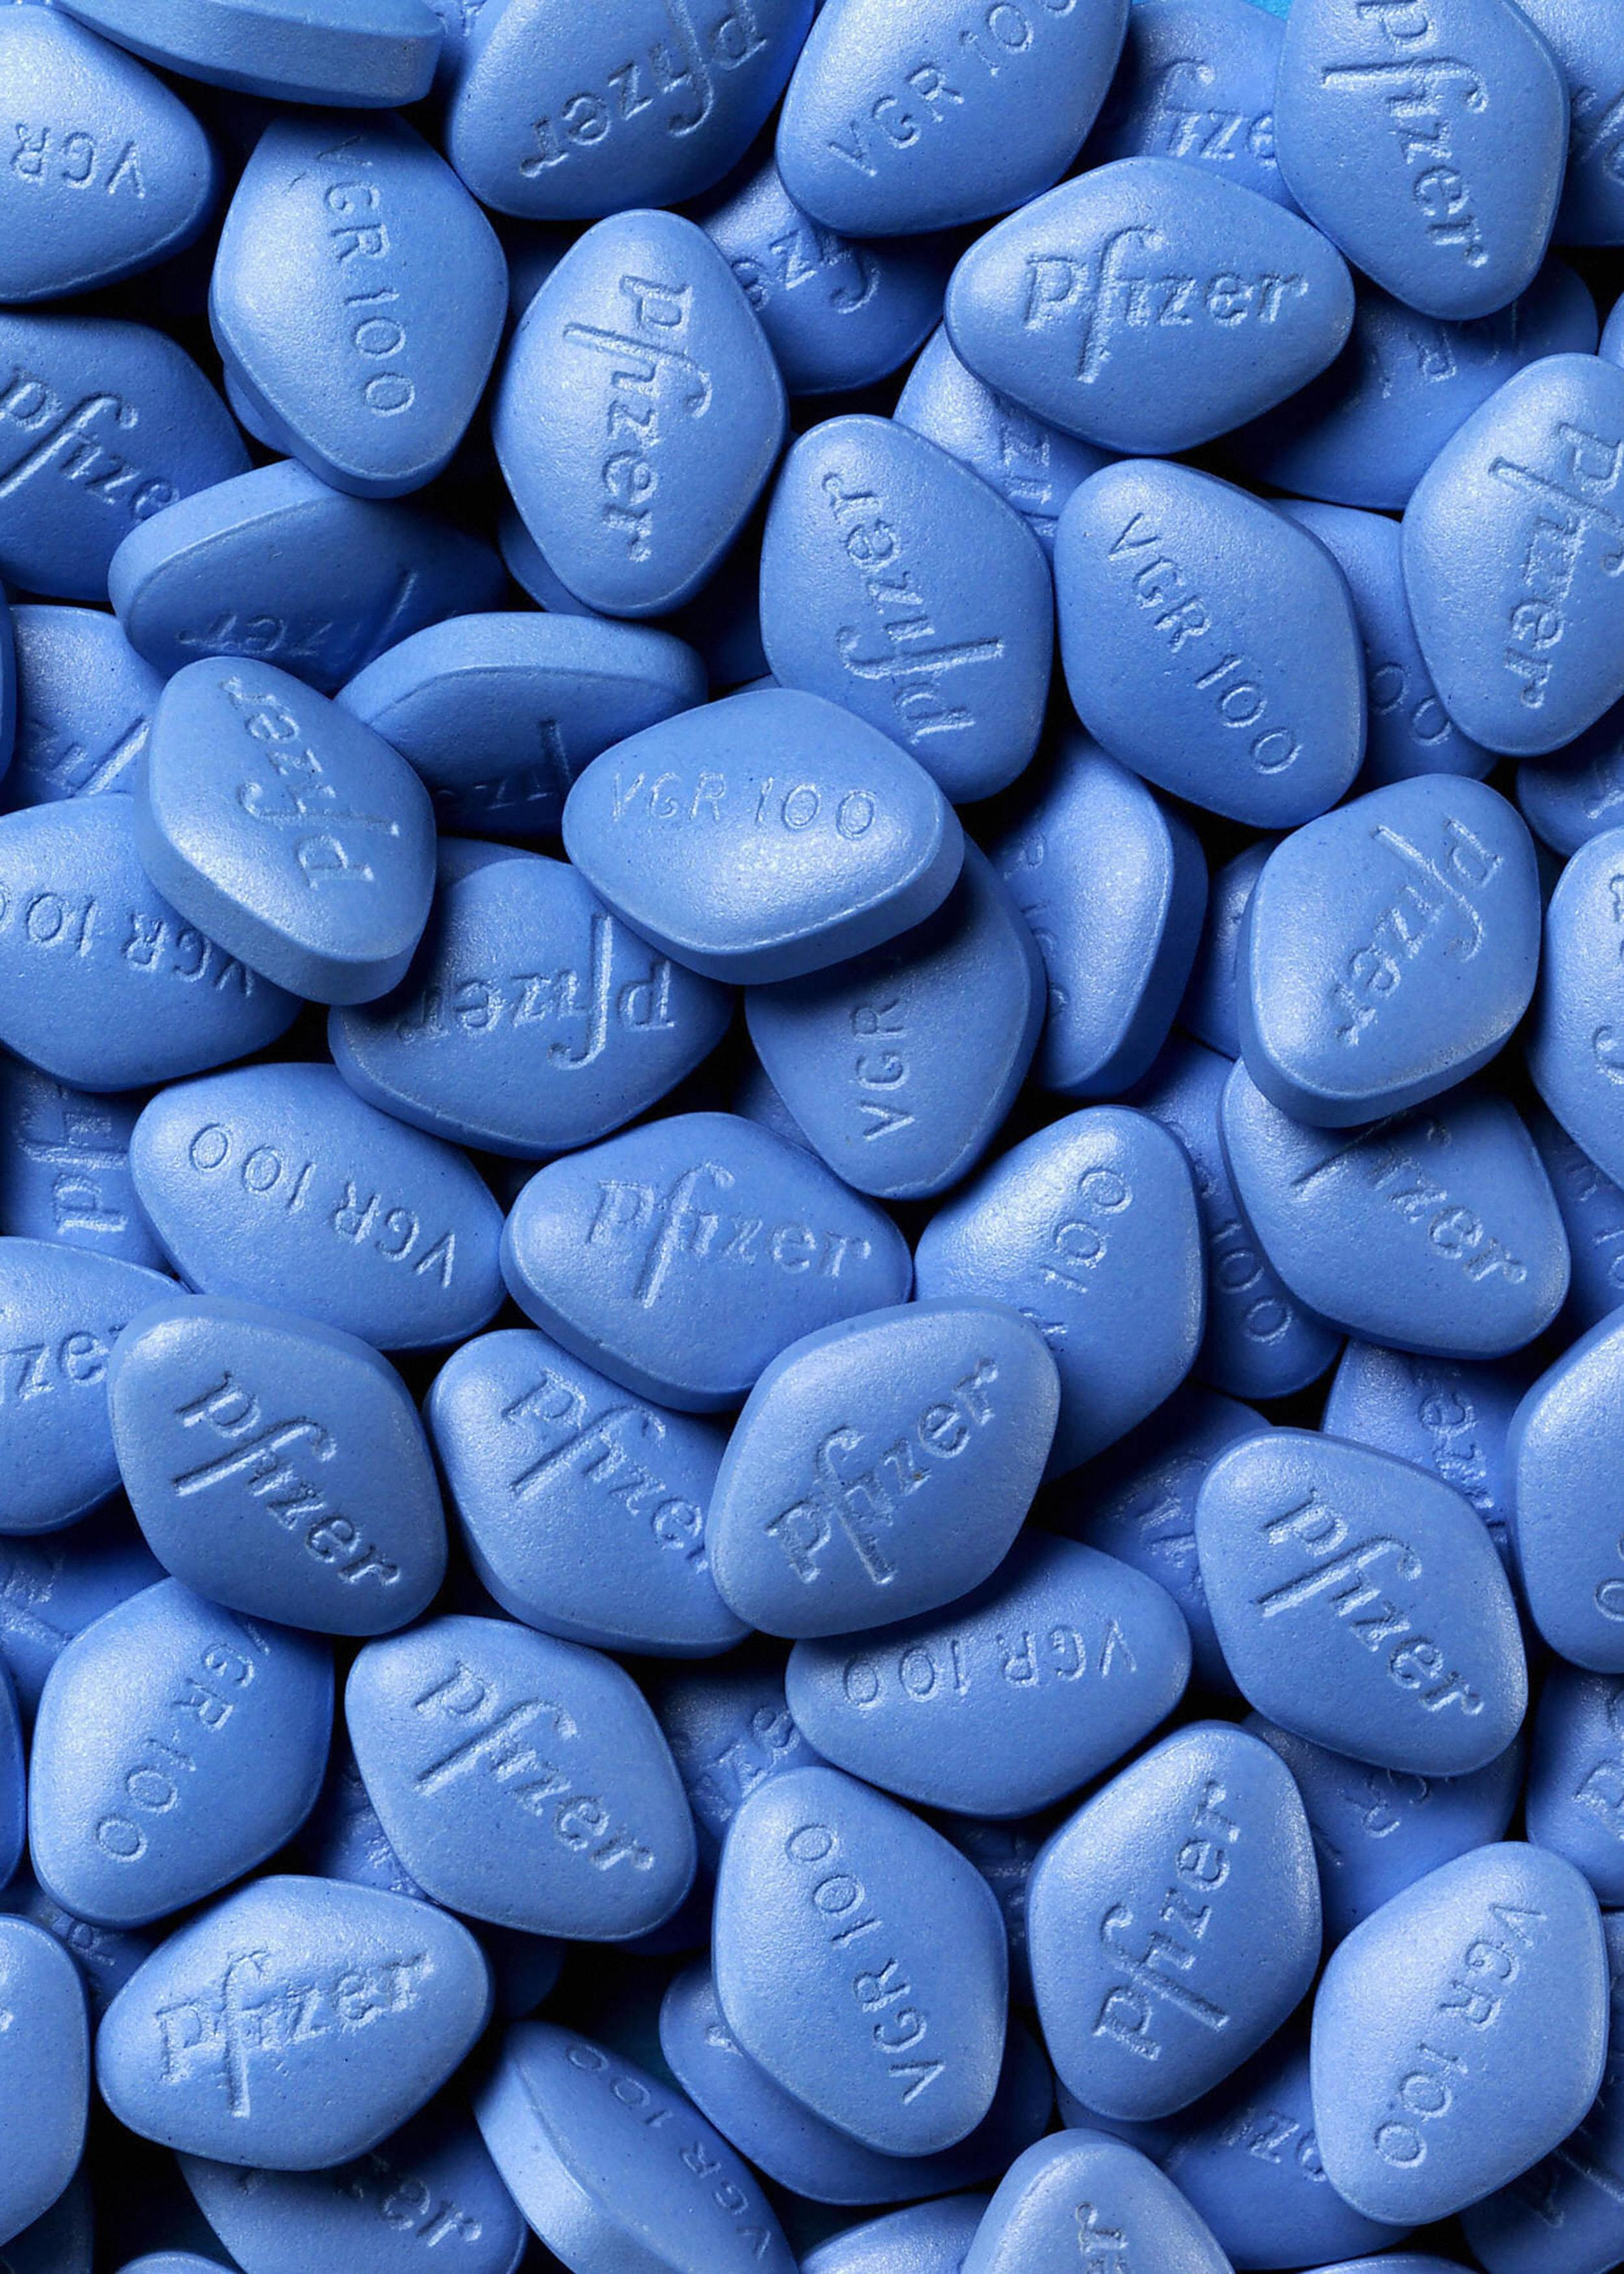 Image: Viagra pills